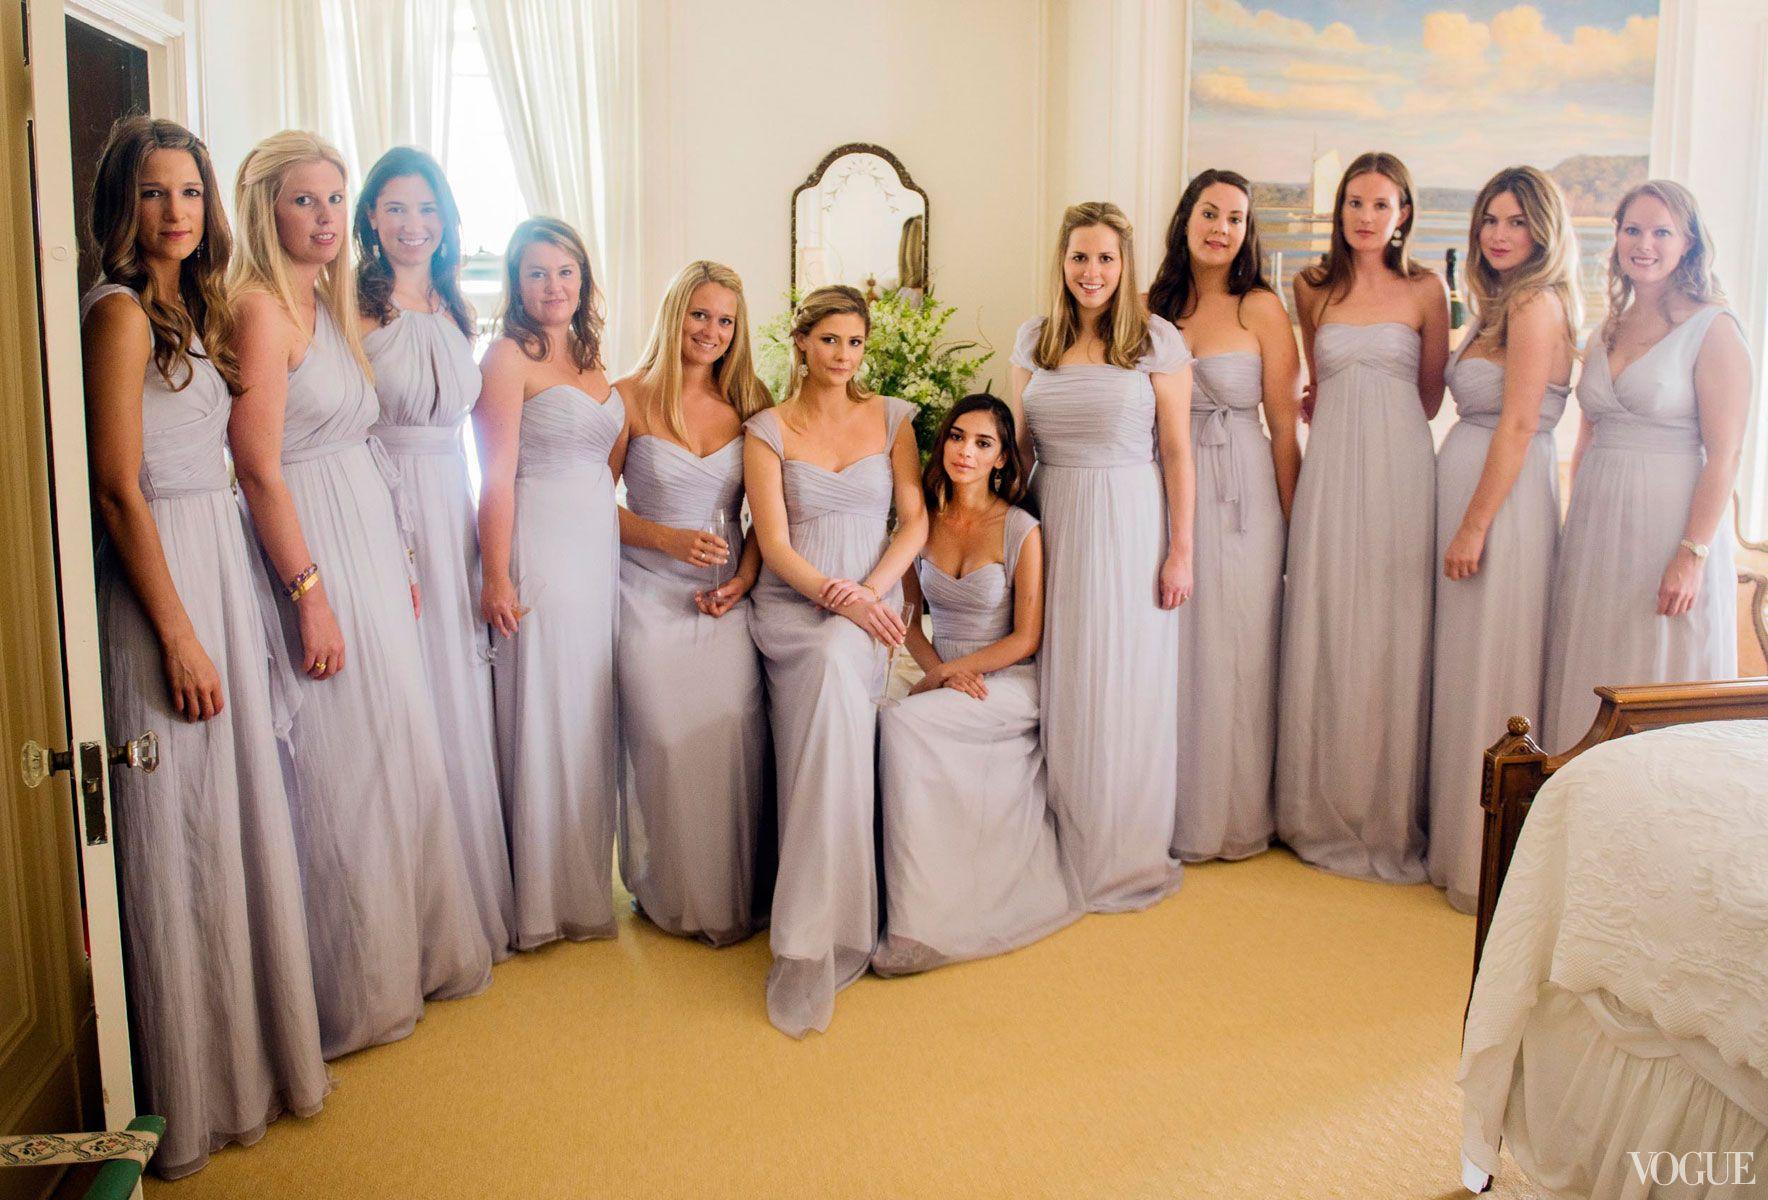 My bridesmaids wore dove gray floor length dresses in varying my bridesmaids wore dove gray floor length dresses in varying styles the color felt ombrellifo Choice Image